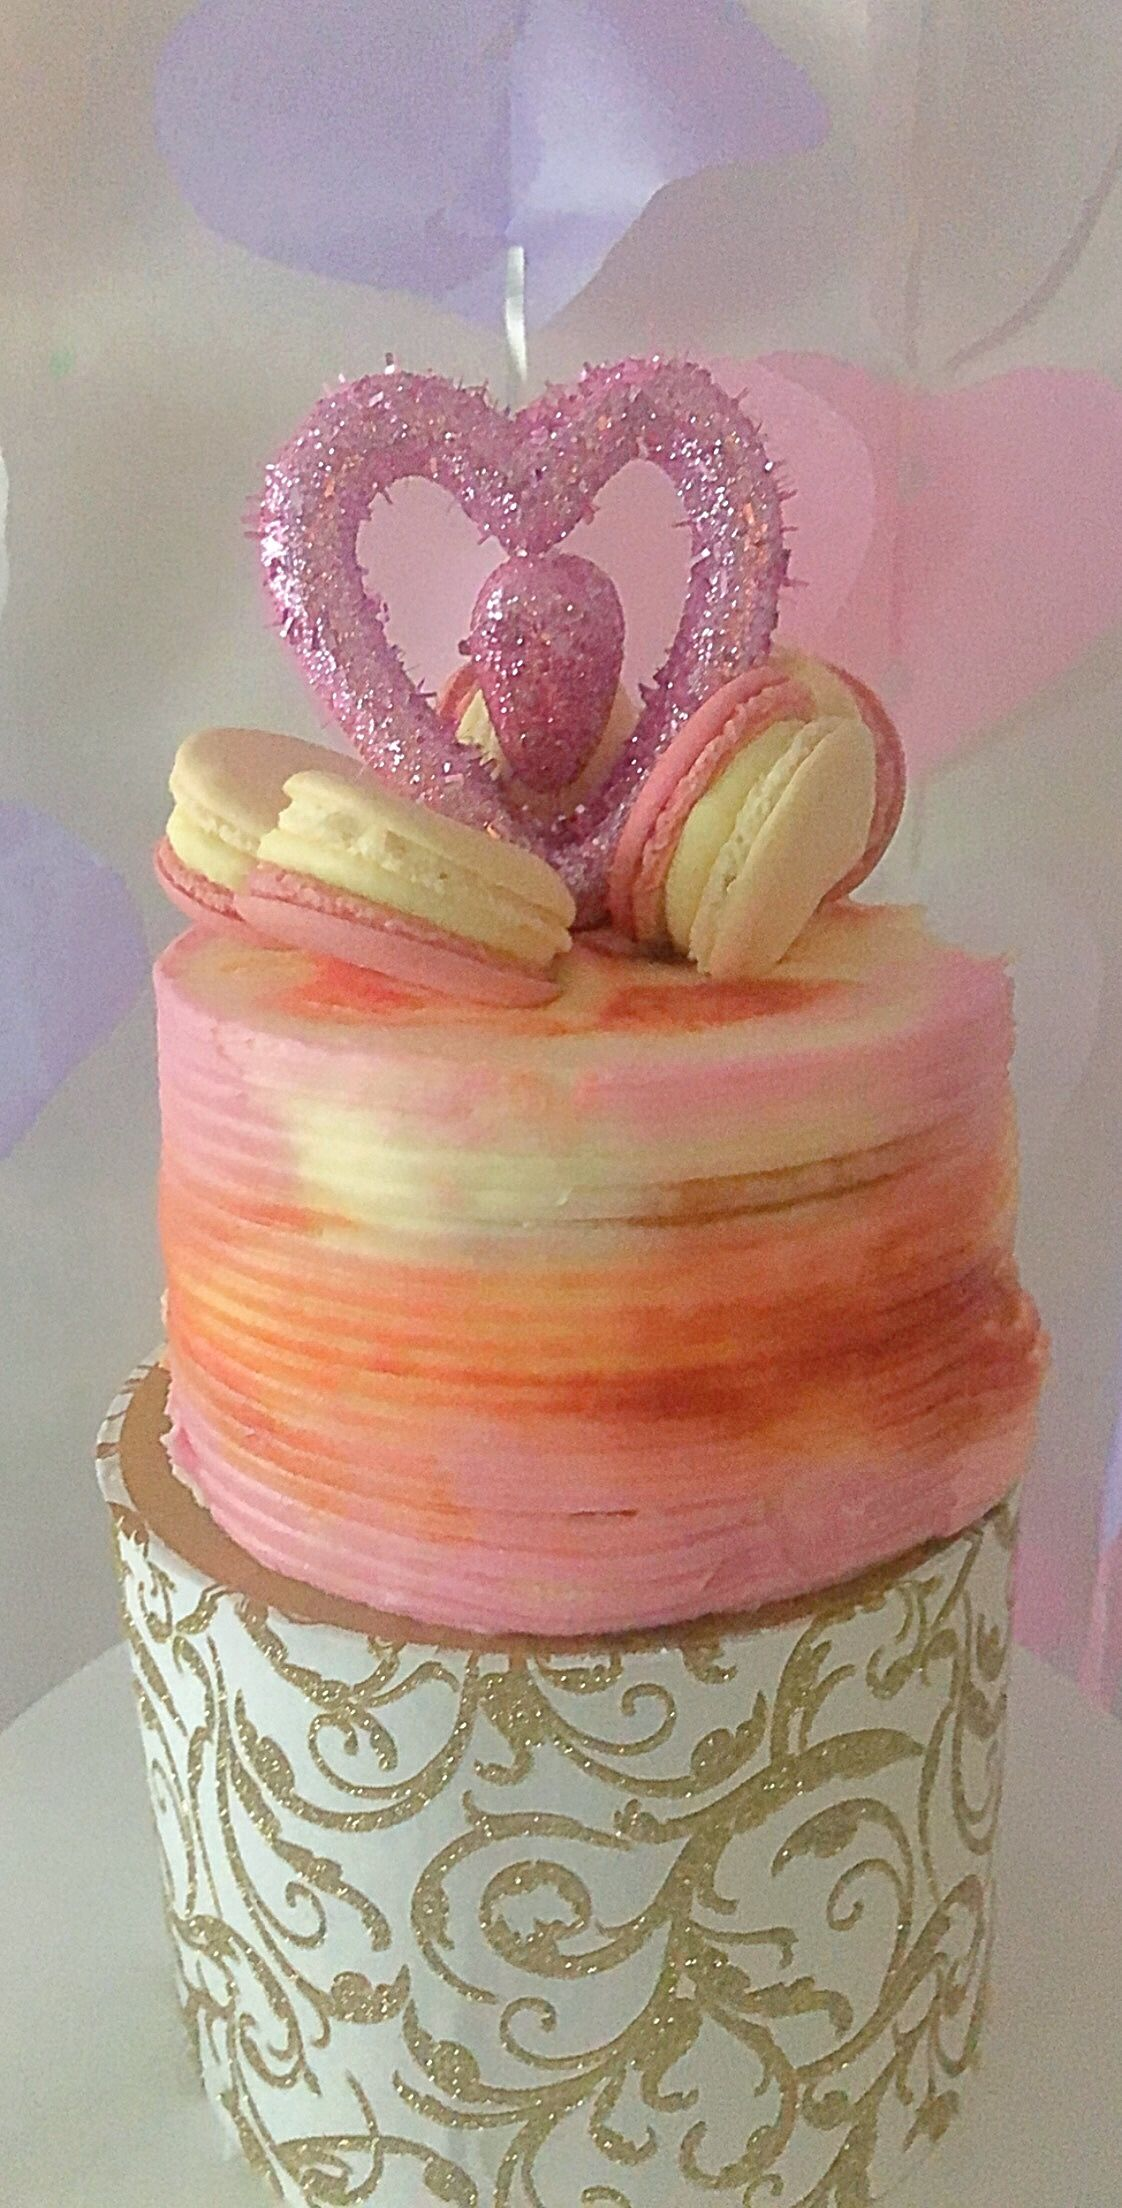 Cake ideas art design by ms tara of lily indkart studios